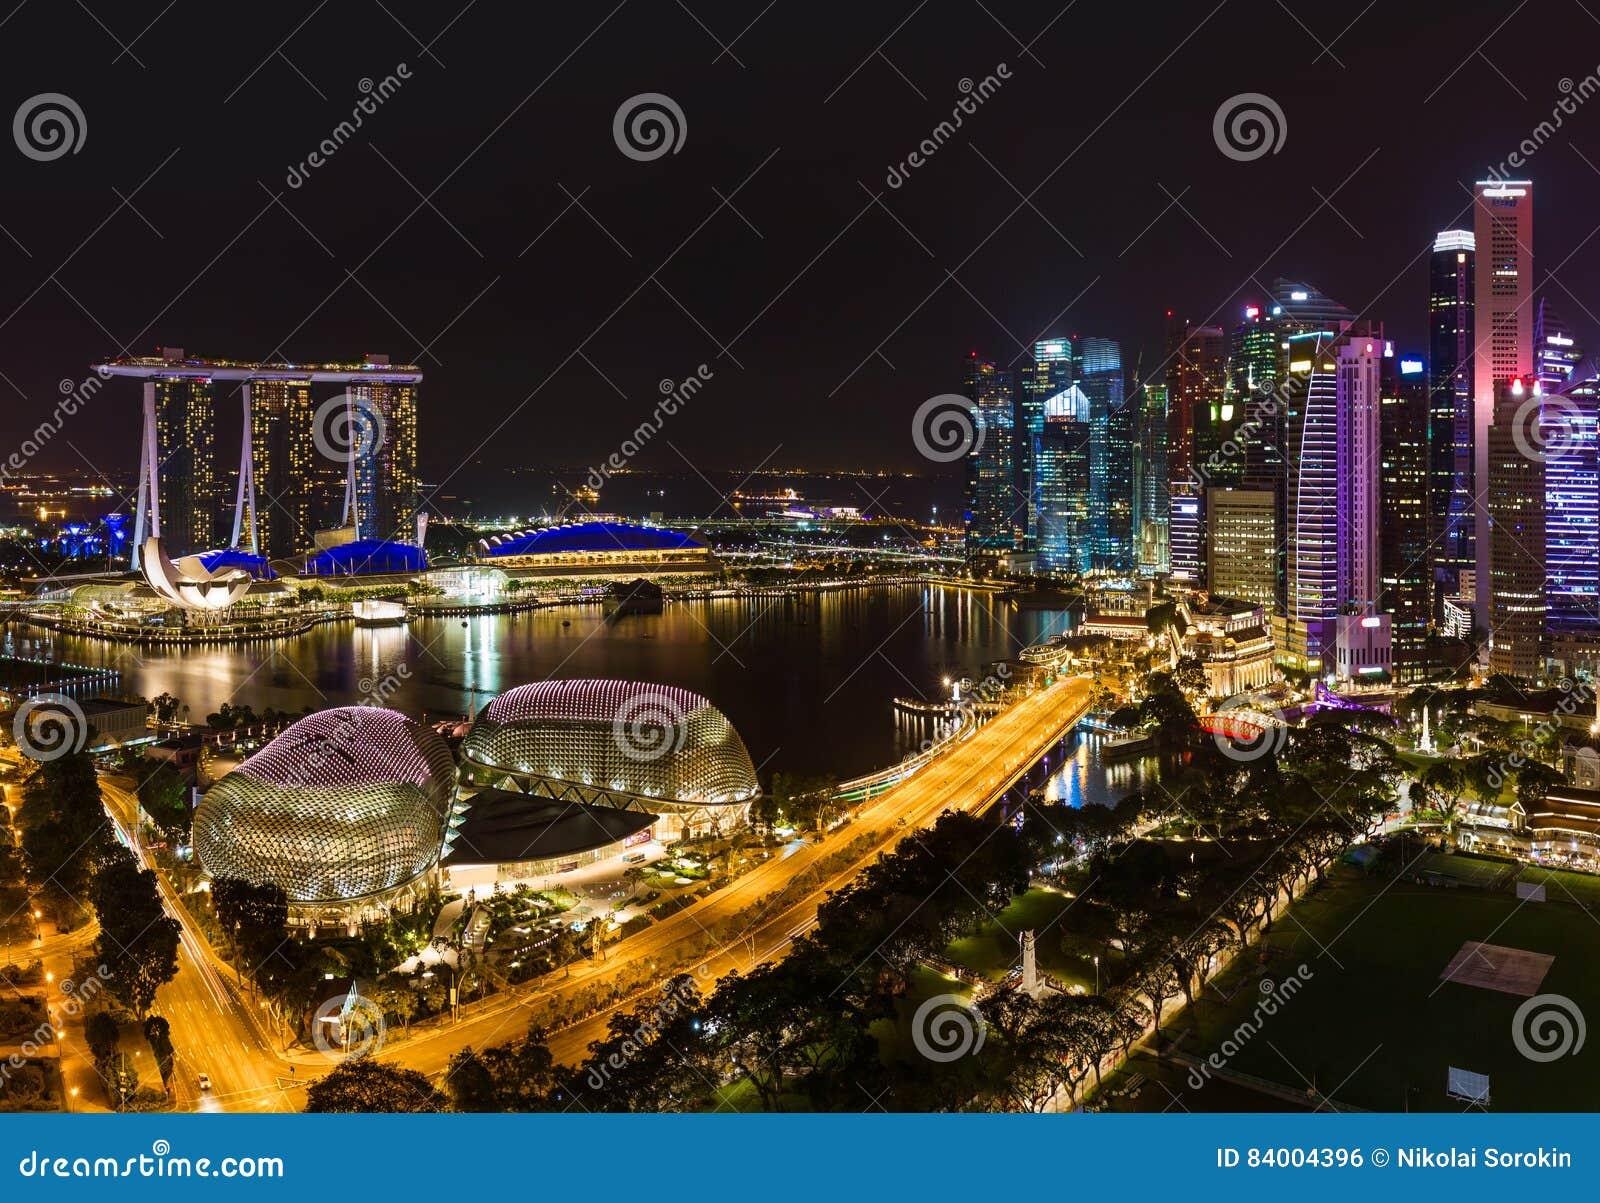 Download Singapore city skyline stock photo. Image of city, gardens - 84004396